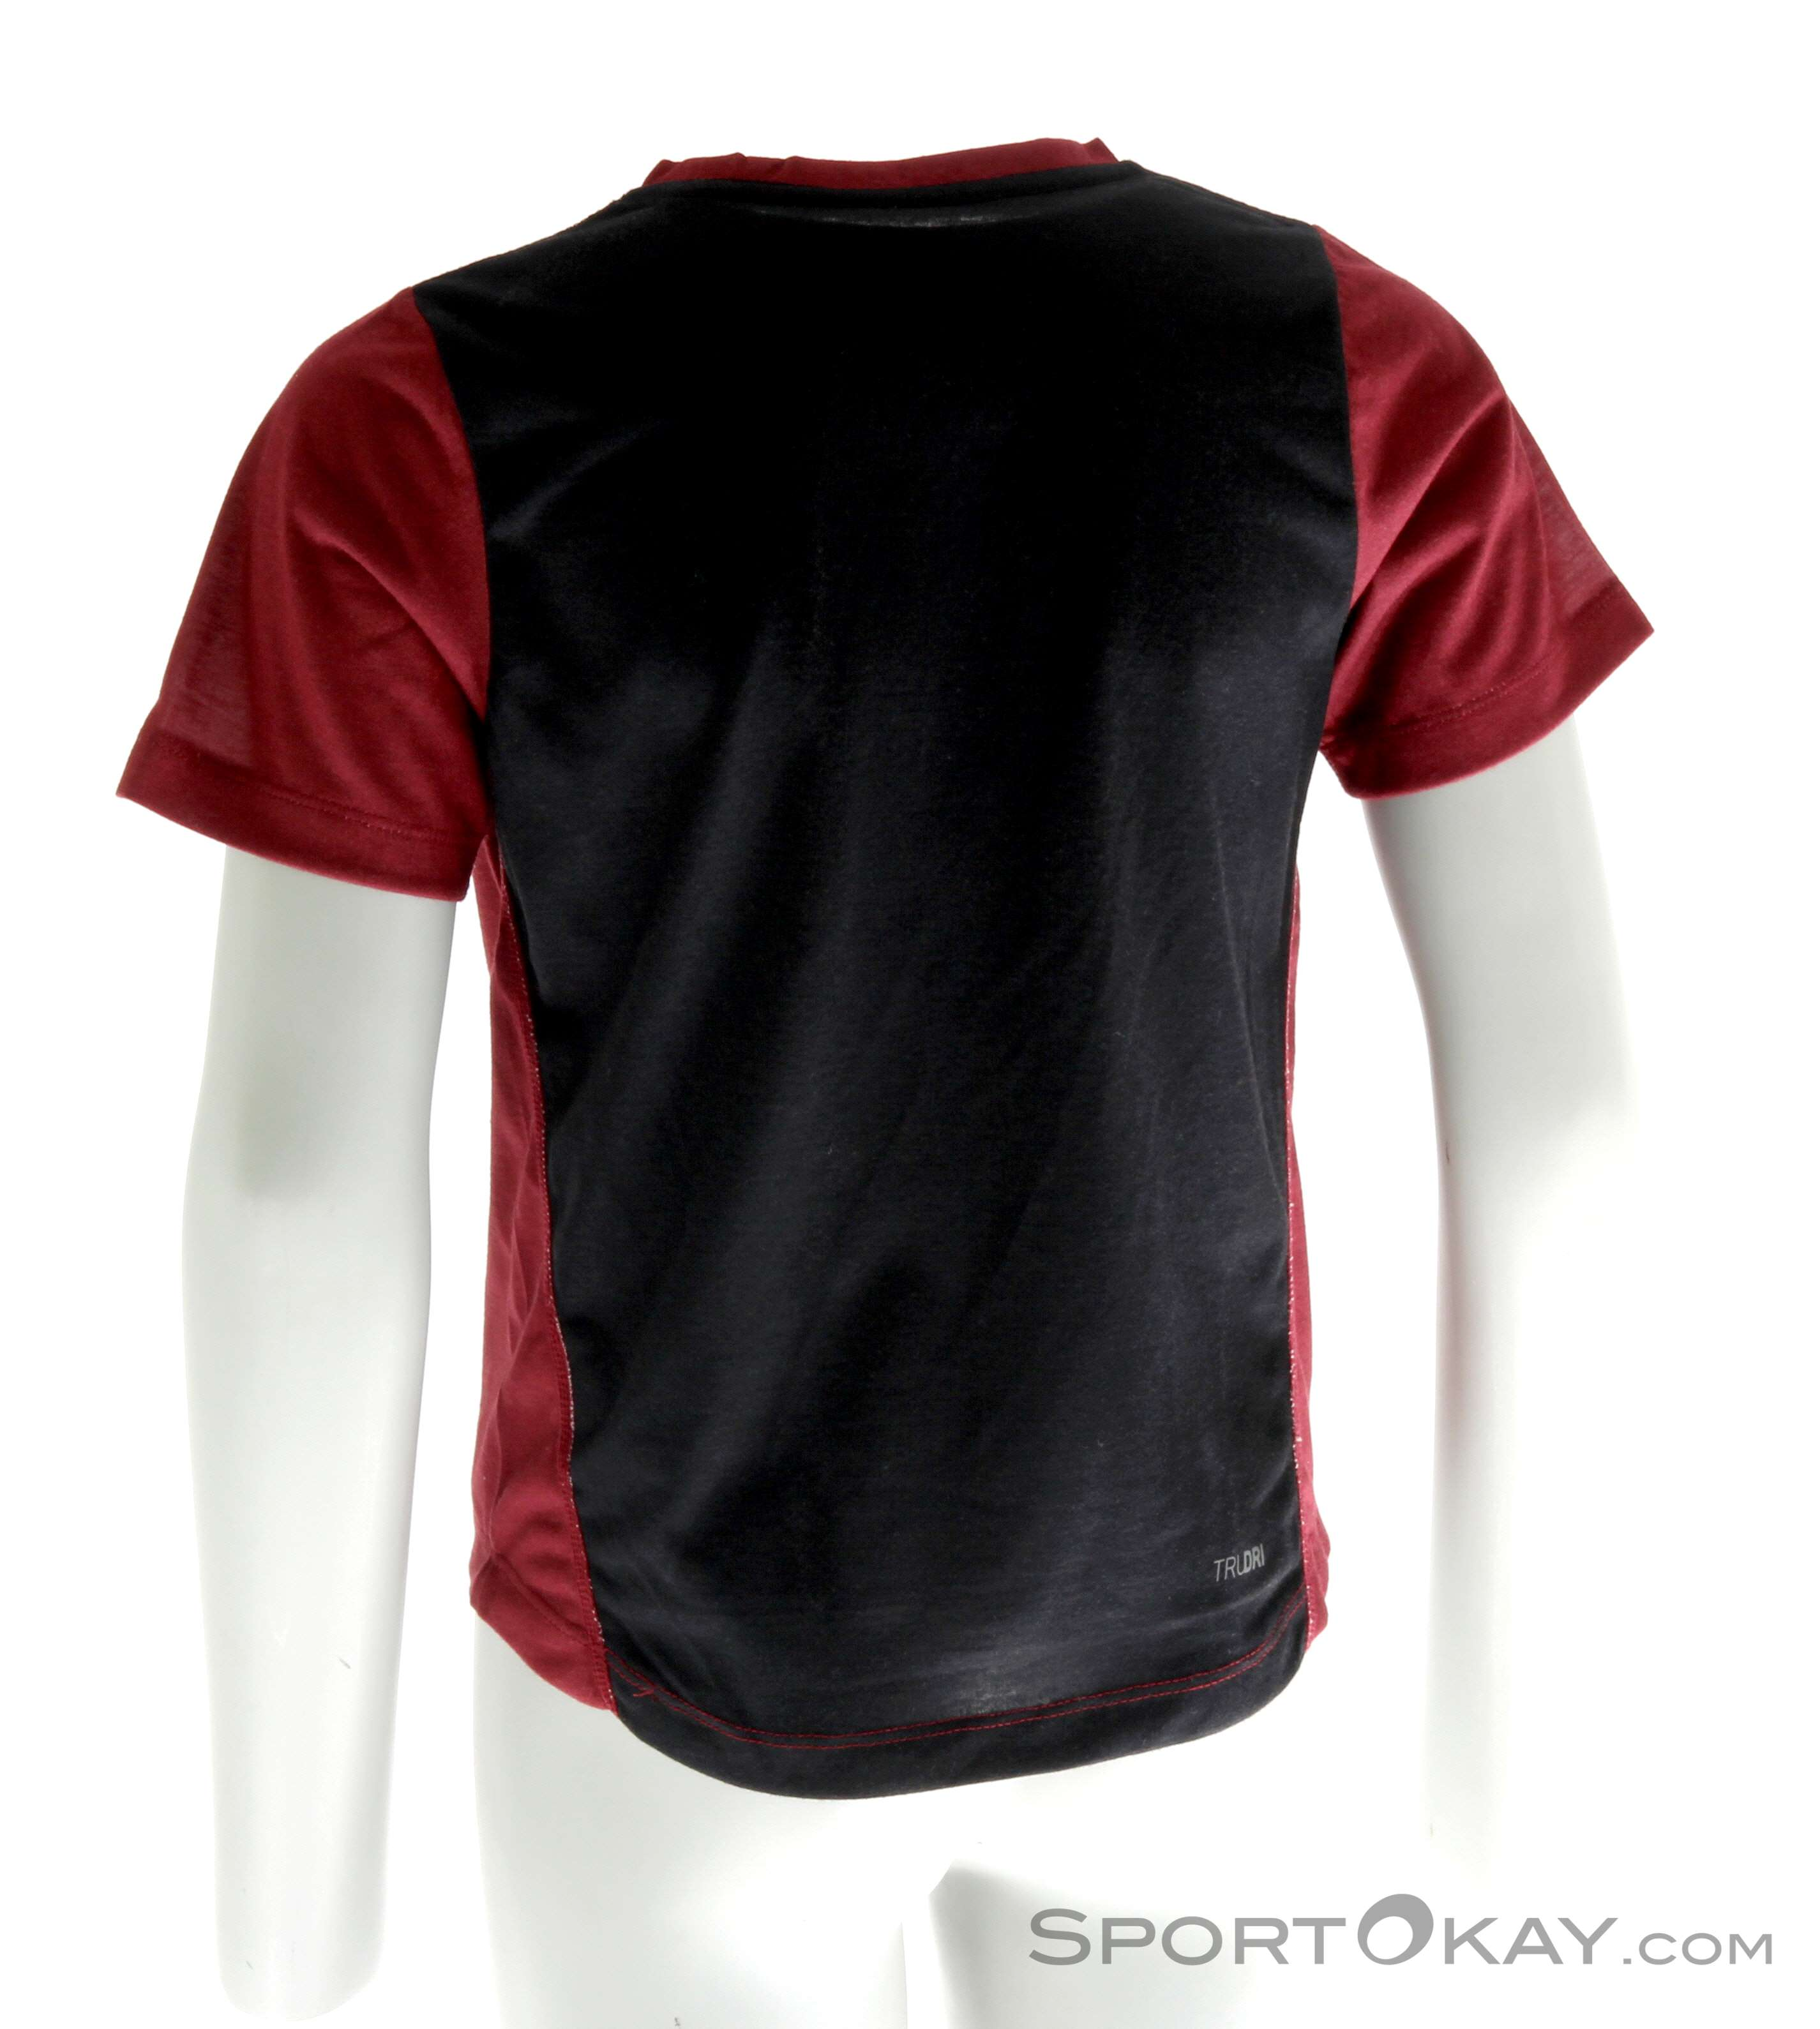 8399009e9 Fox Junior Indicator Jersey Boys Biking Shirt - Shirts   T-Shirts ...